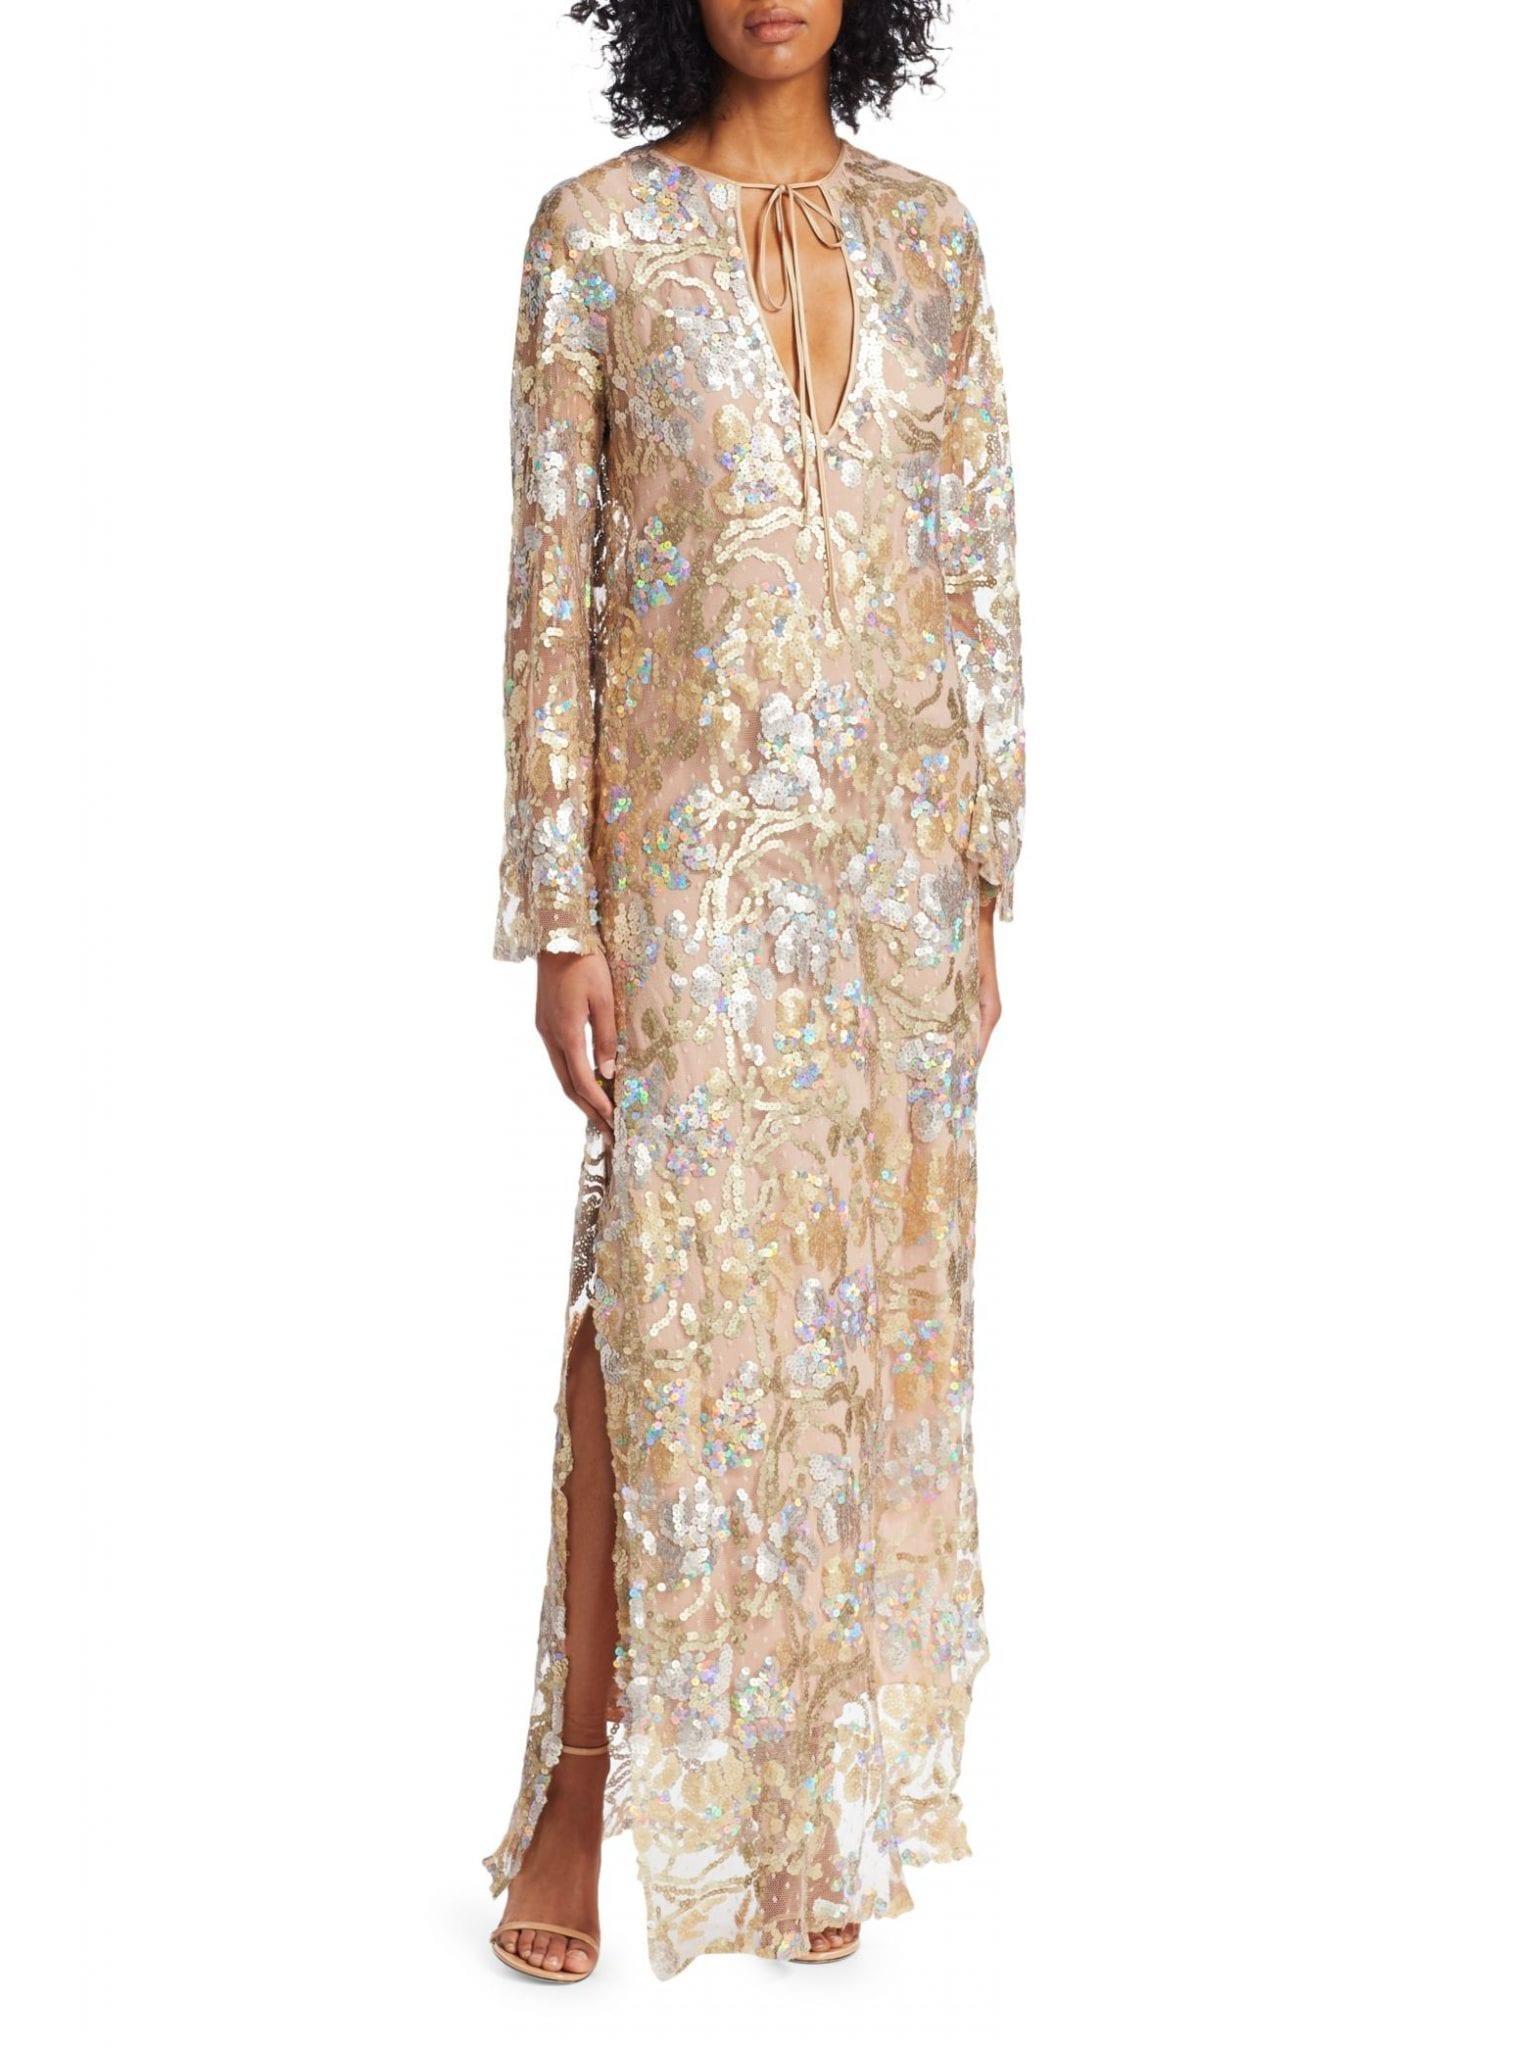 SILVIA TCHERASSI Dogliani Sequin Tunic Gown